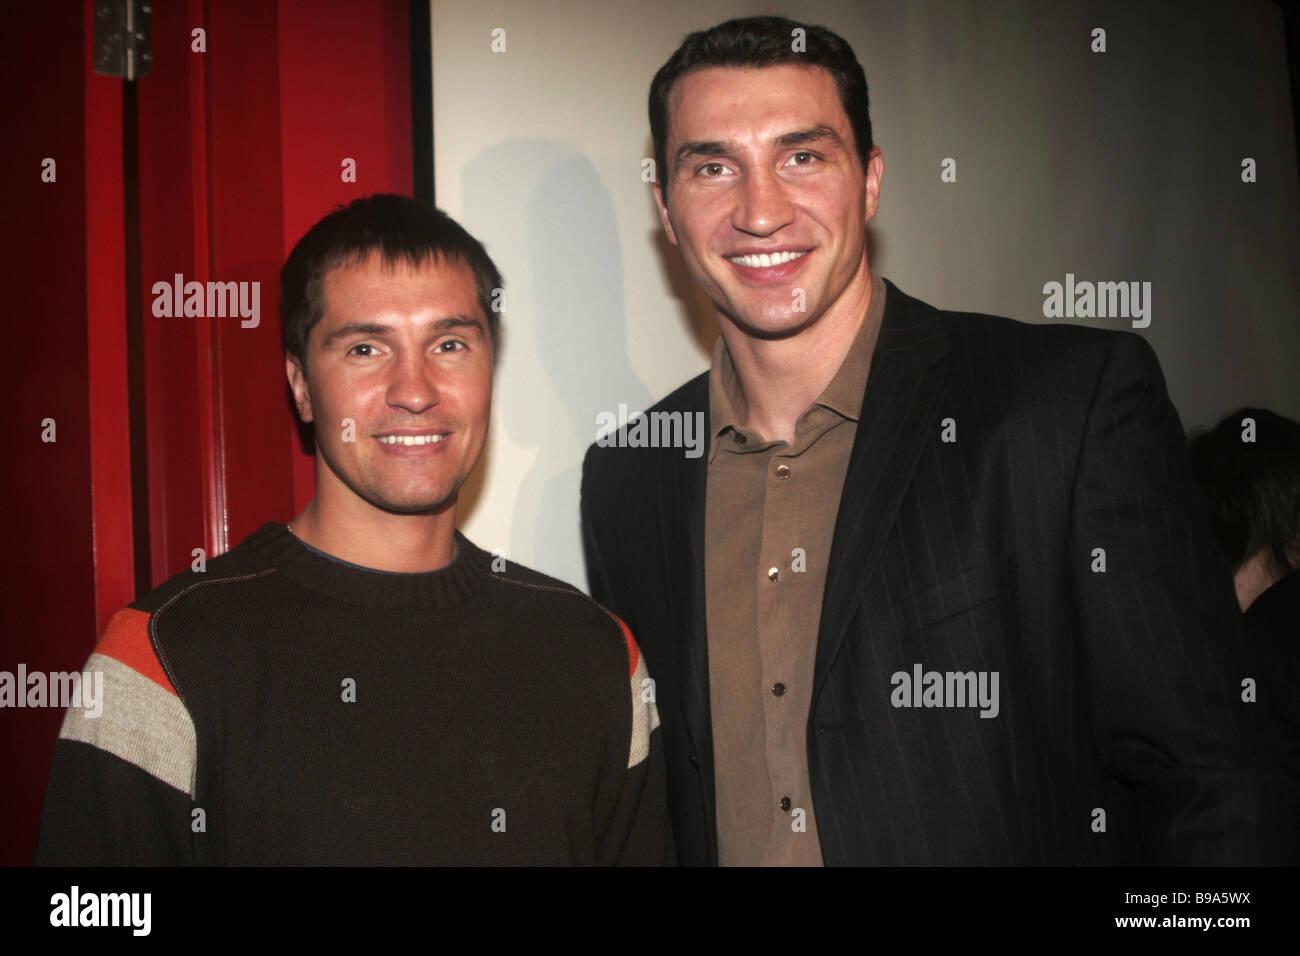 Ukraine's light middle world boxing champion southpaw Sergey Dzindziruk and Vladimir Klitschko, Ukraine's - Stock Image